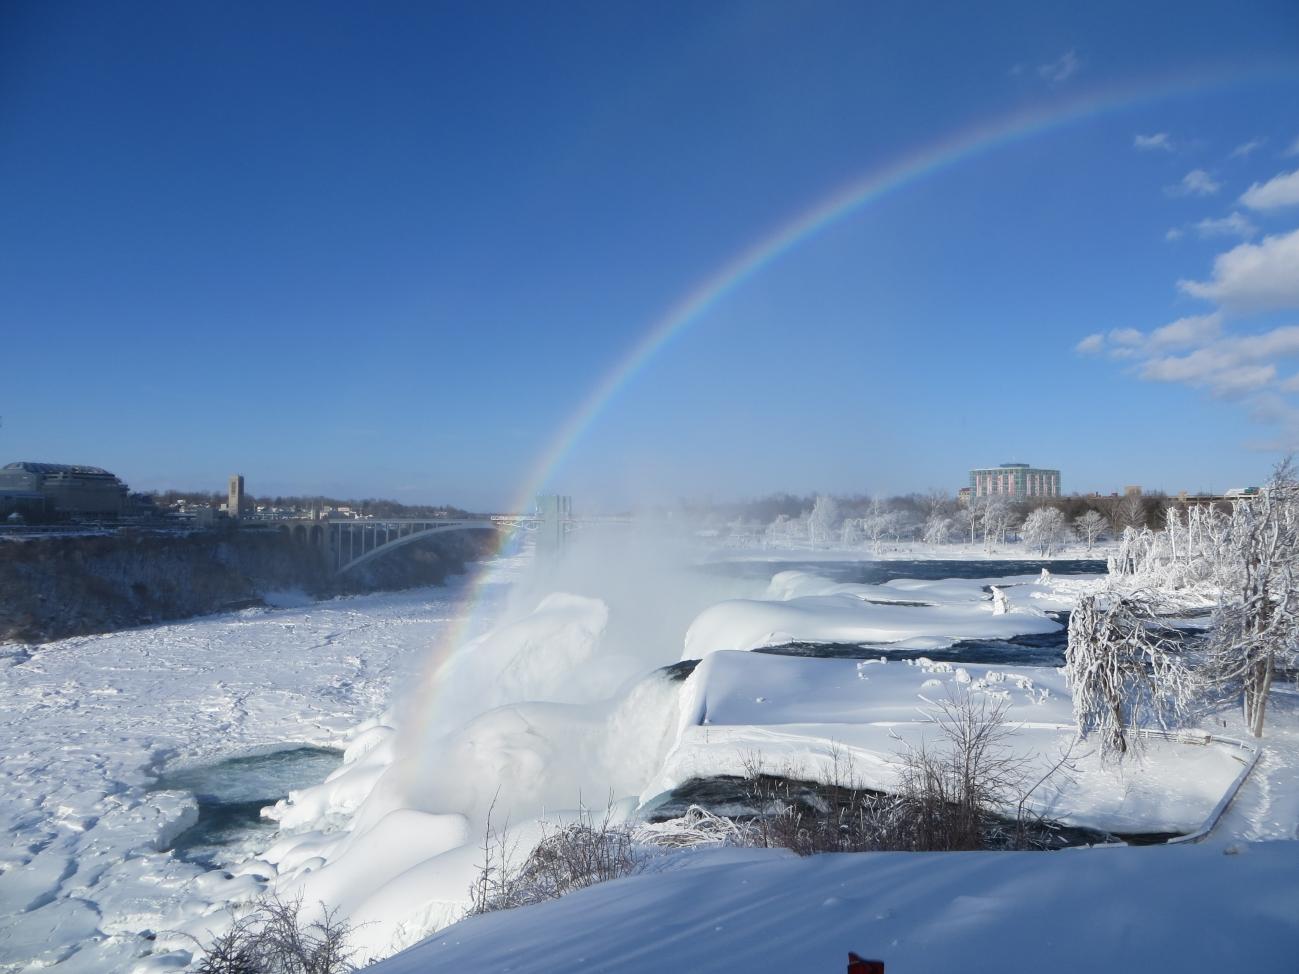 NiagaraFalls-Rainbows-1.JPG